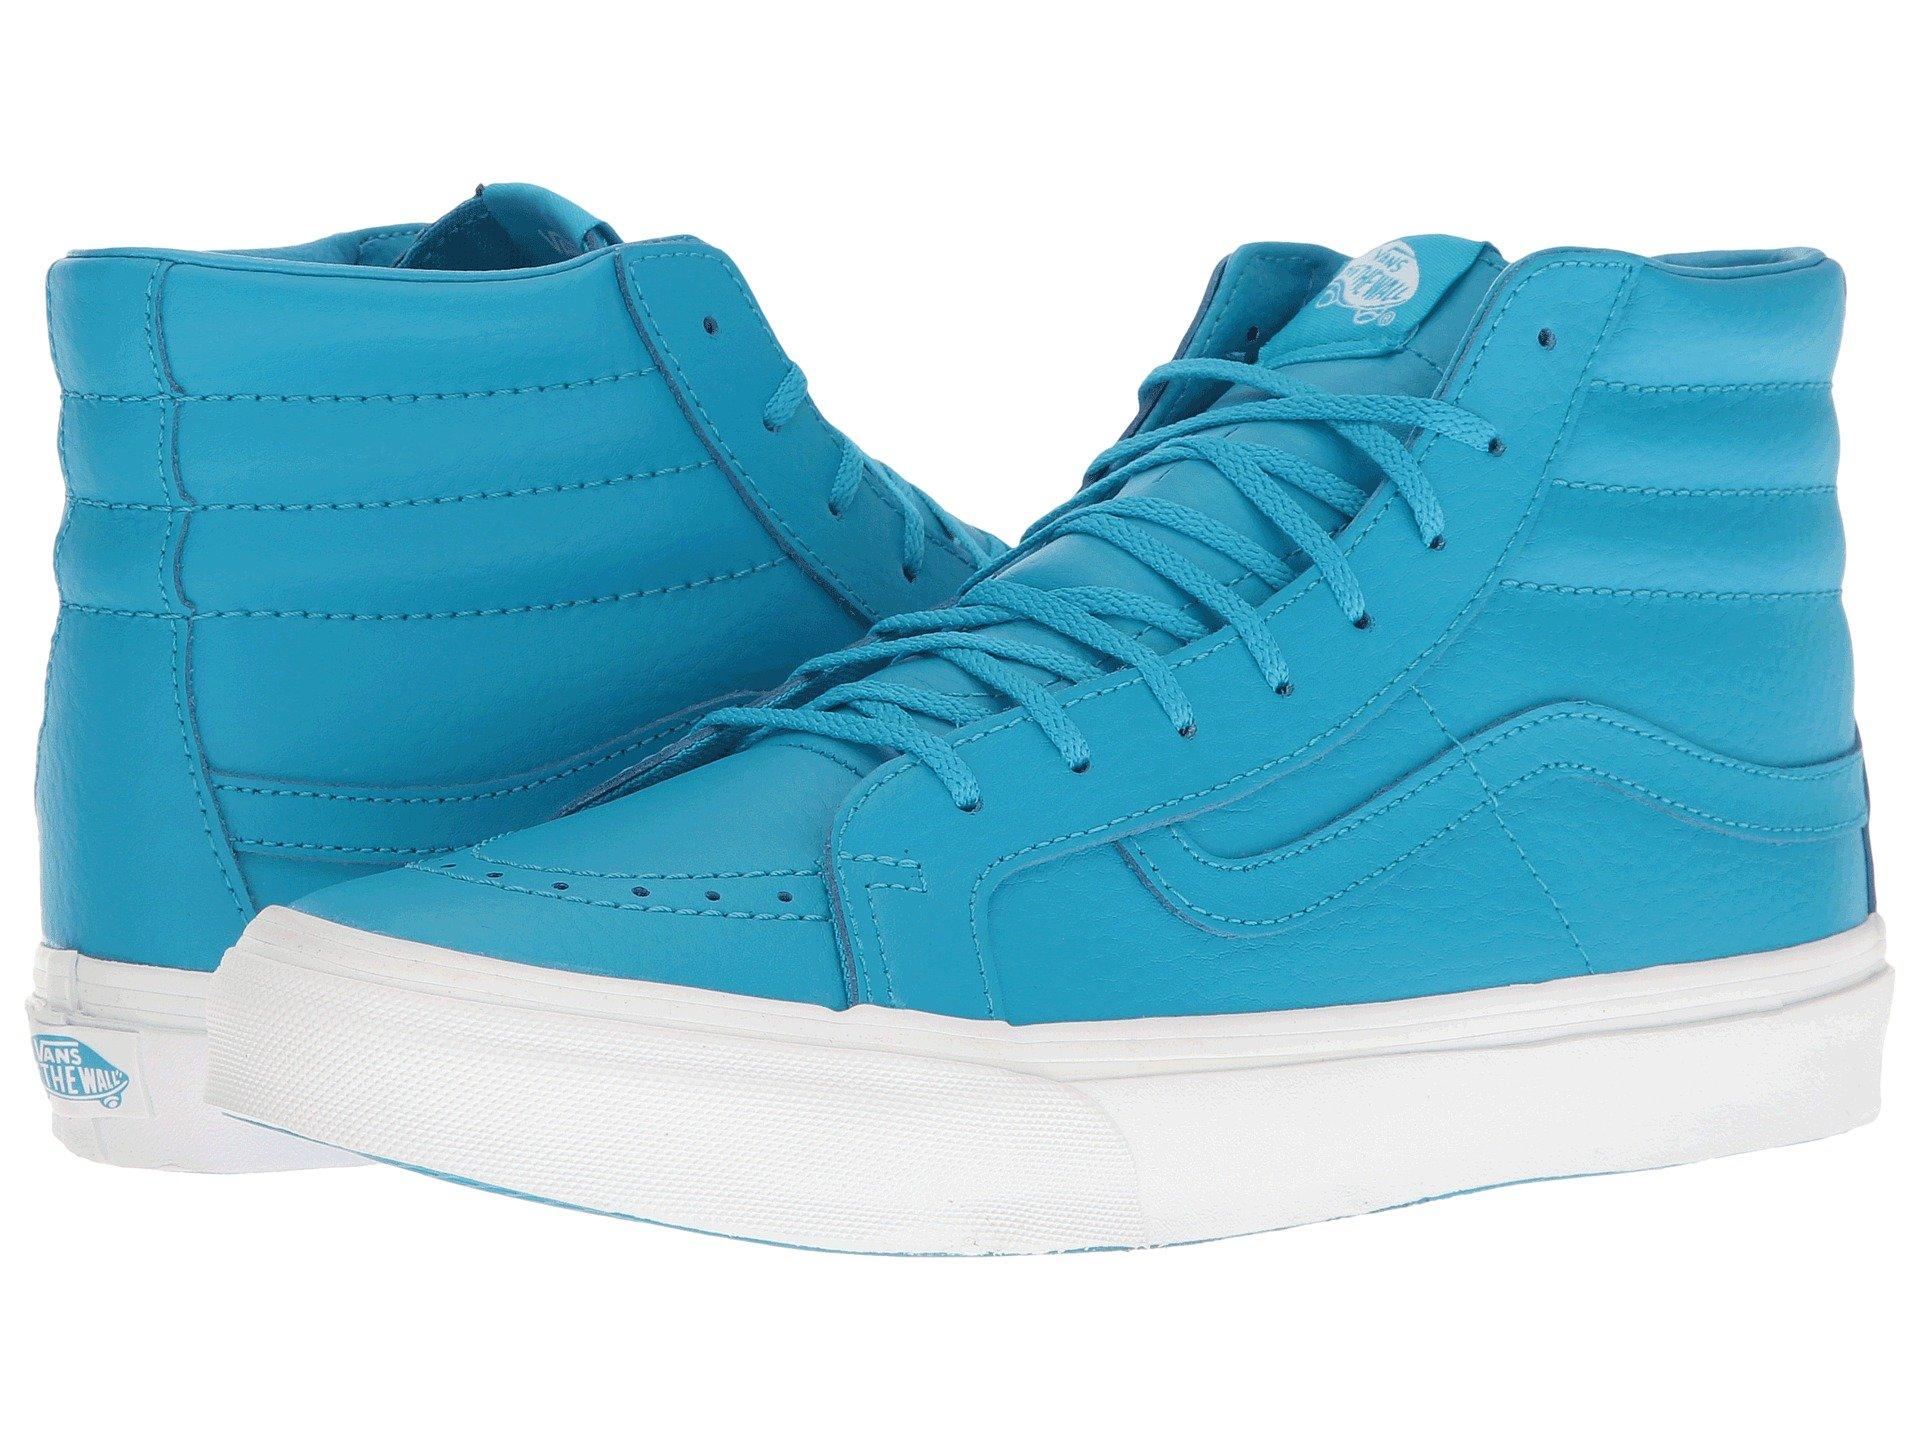 4ff5f1efa8da88 Vans Sk8-Hi Slim In (Neon Leather) Neon Blue True White